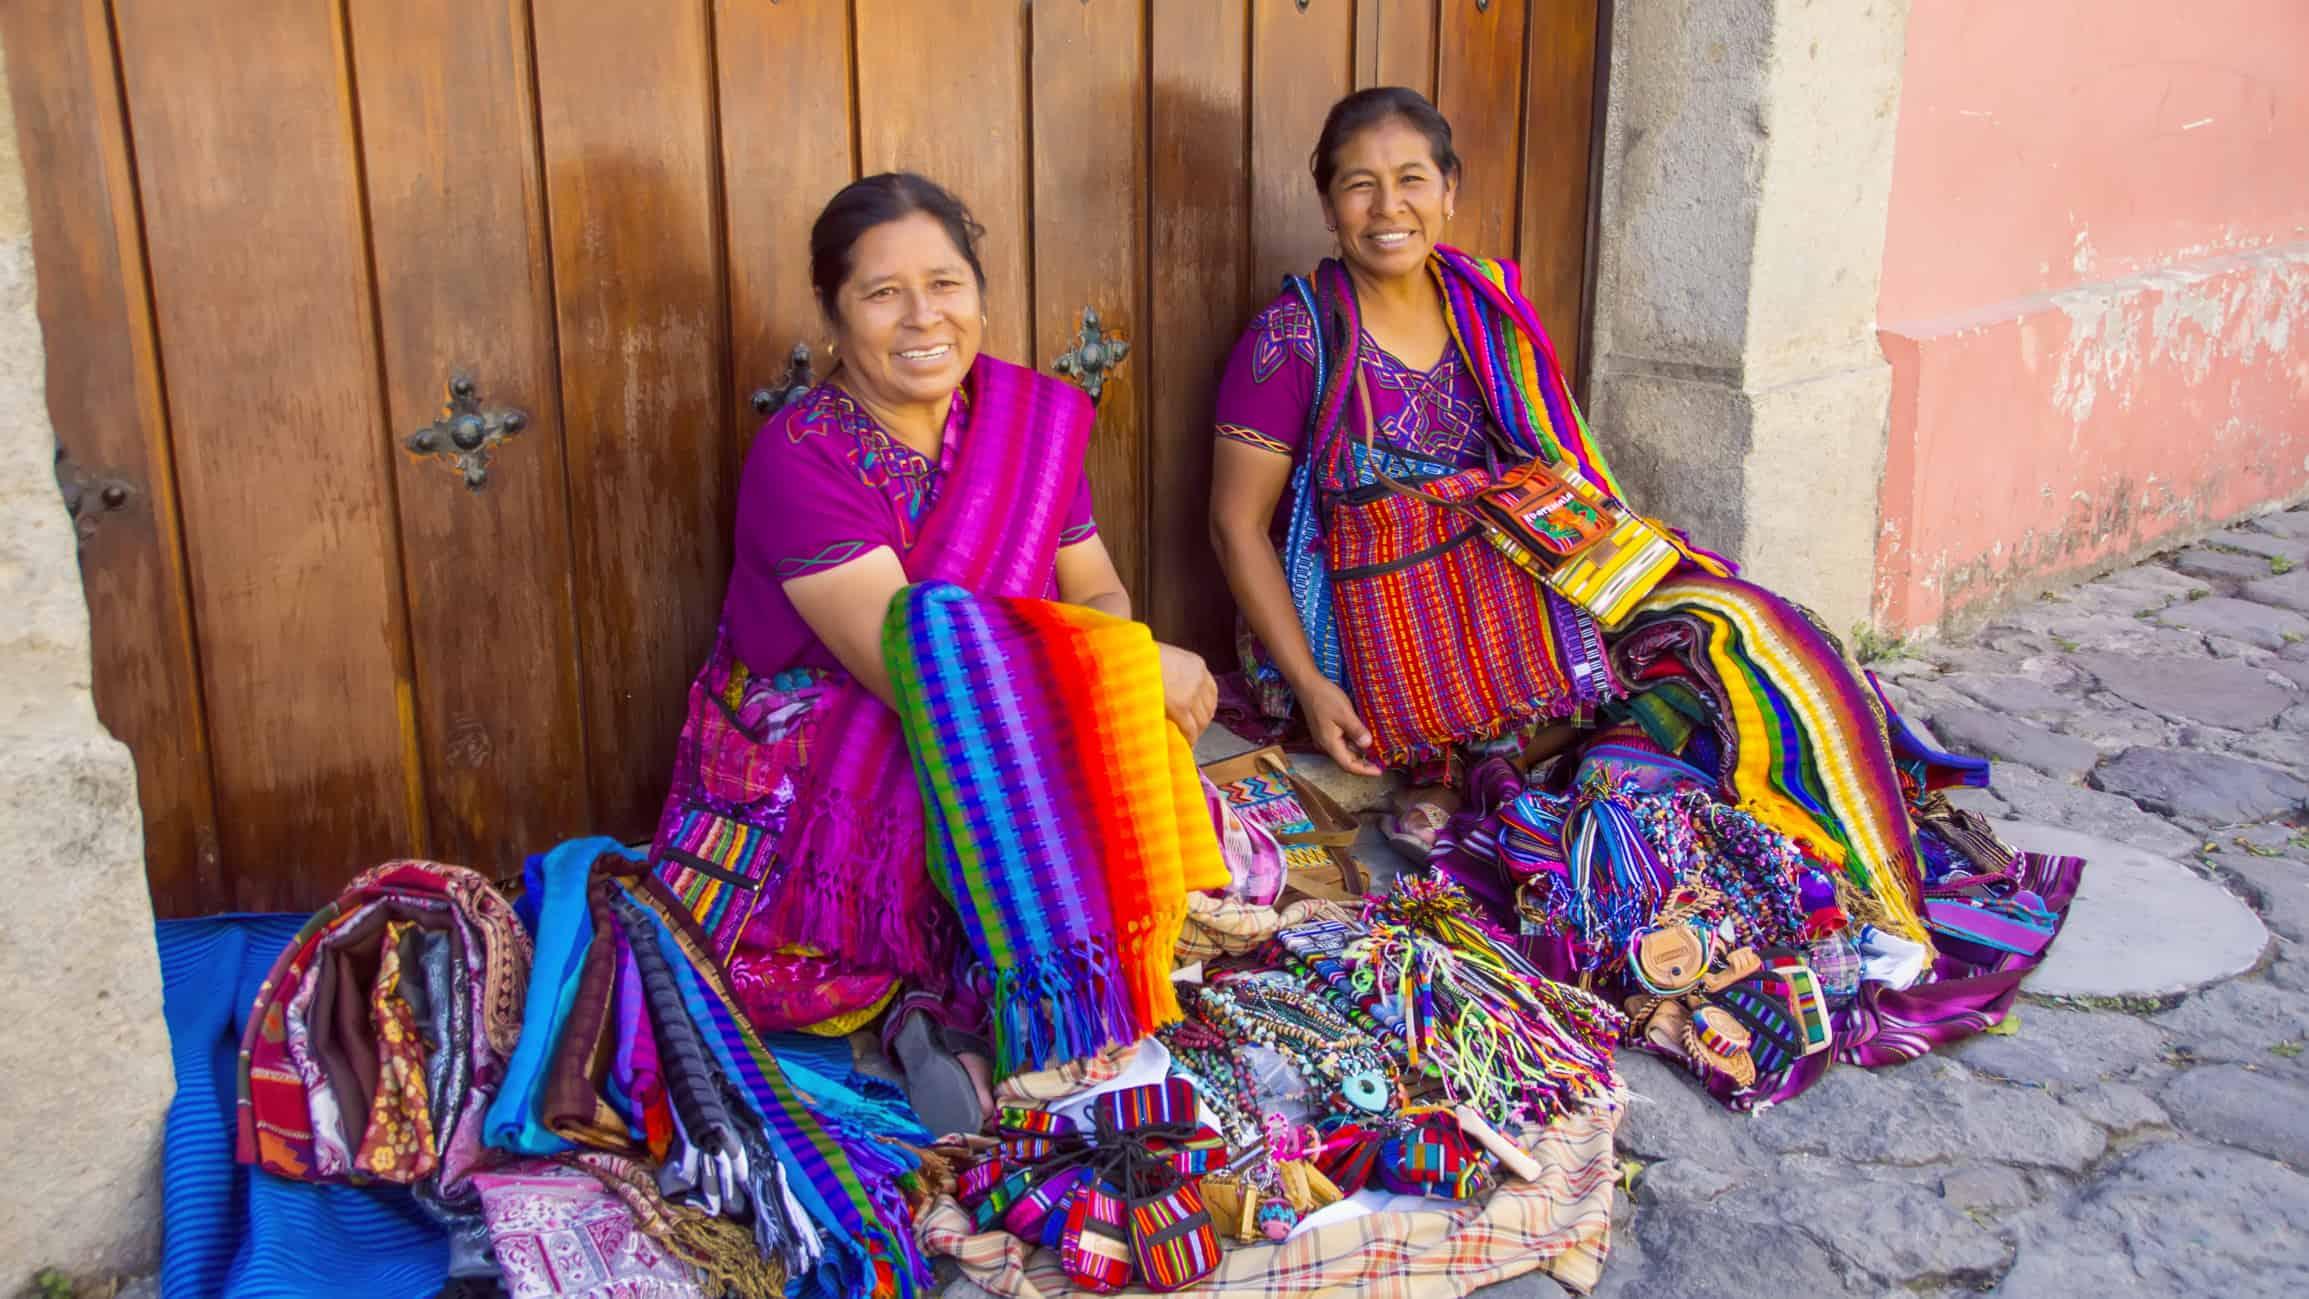 Mayan women selling handmade textiles and souvenirs, Antigua, Guatemala